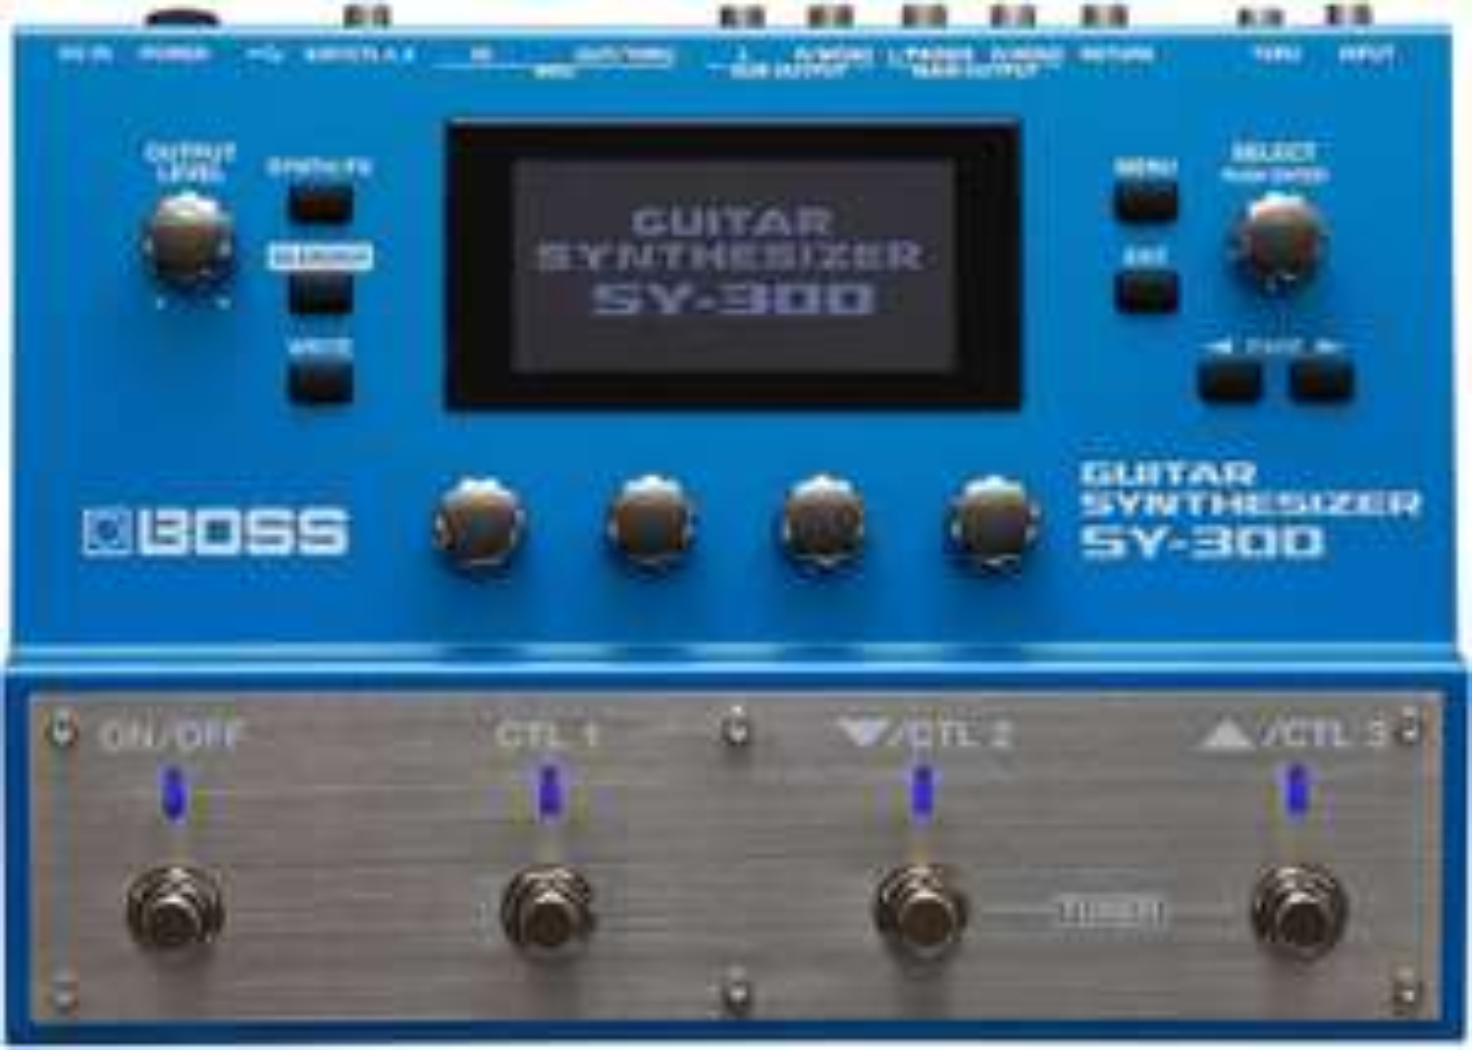 Boss SY-300 Guitar Synthesizer (über Idealo oder muziker.de)